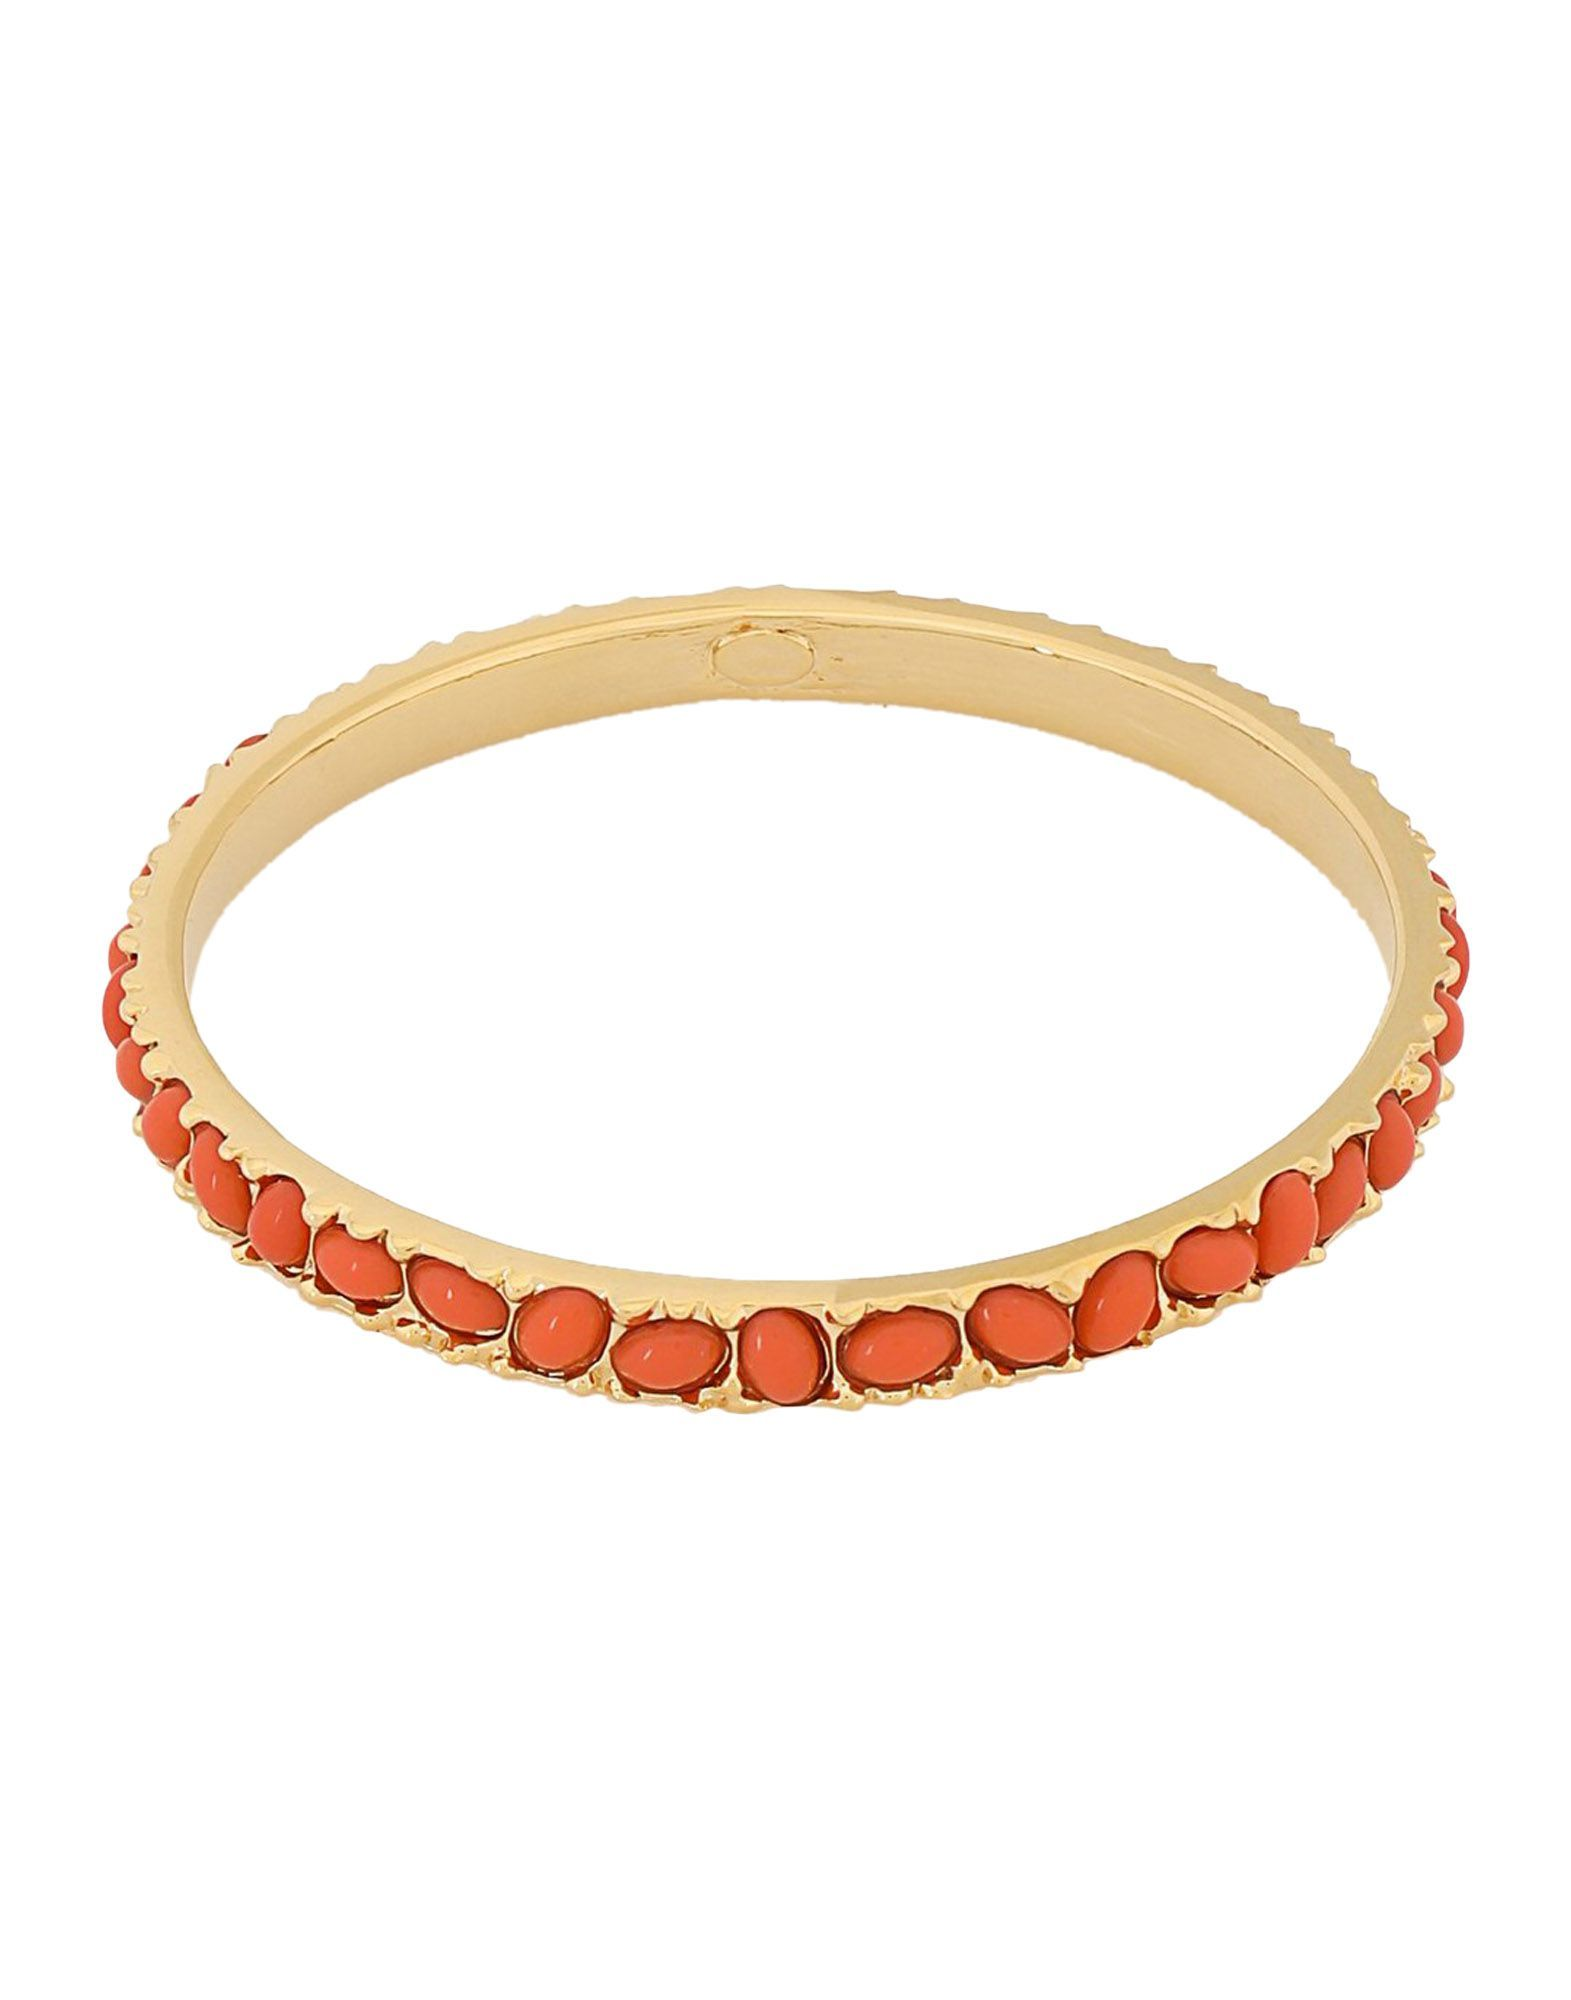 Kenneth Jay Lane Orange Gold Plated Bracelet